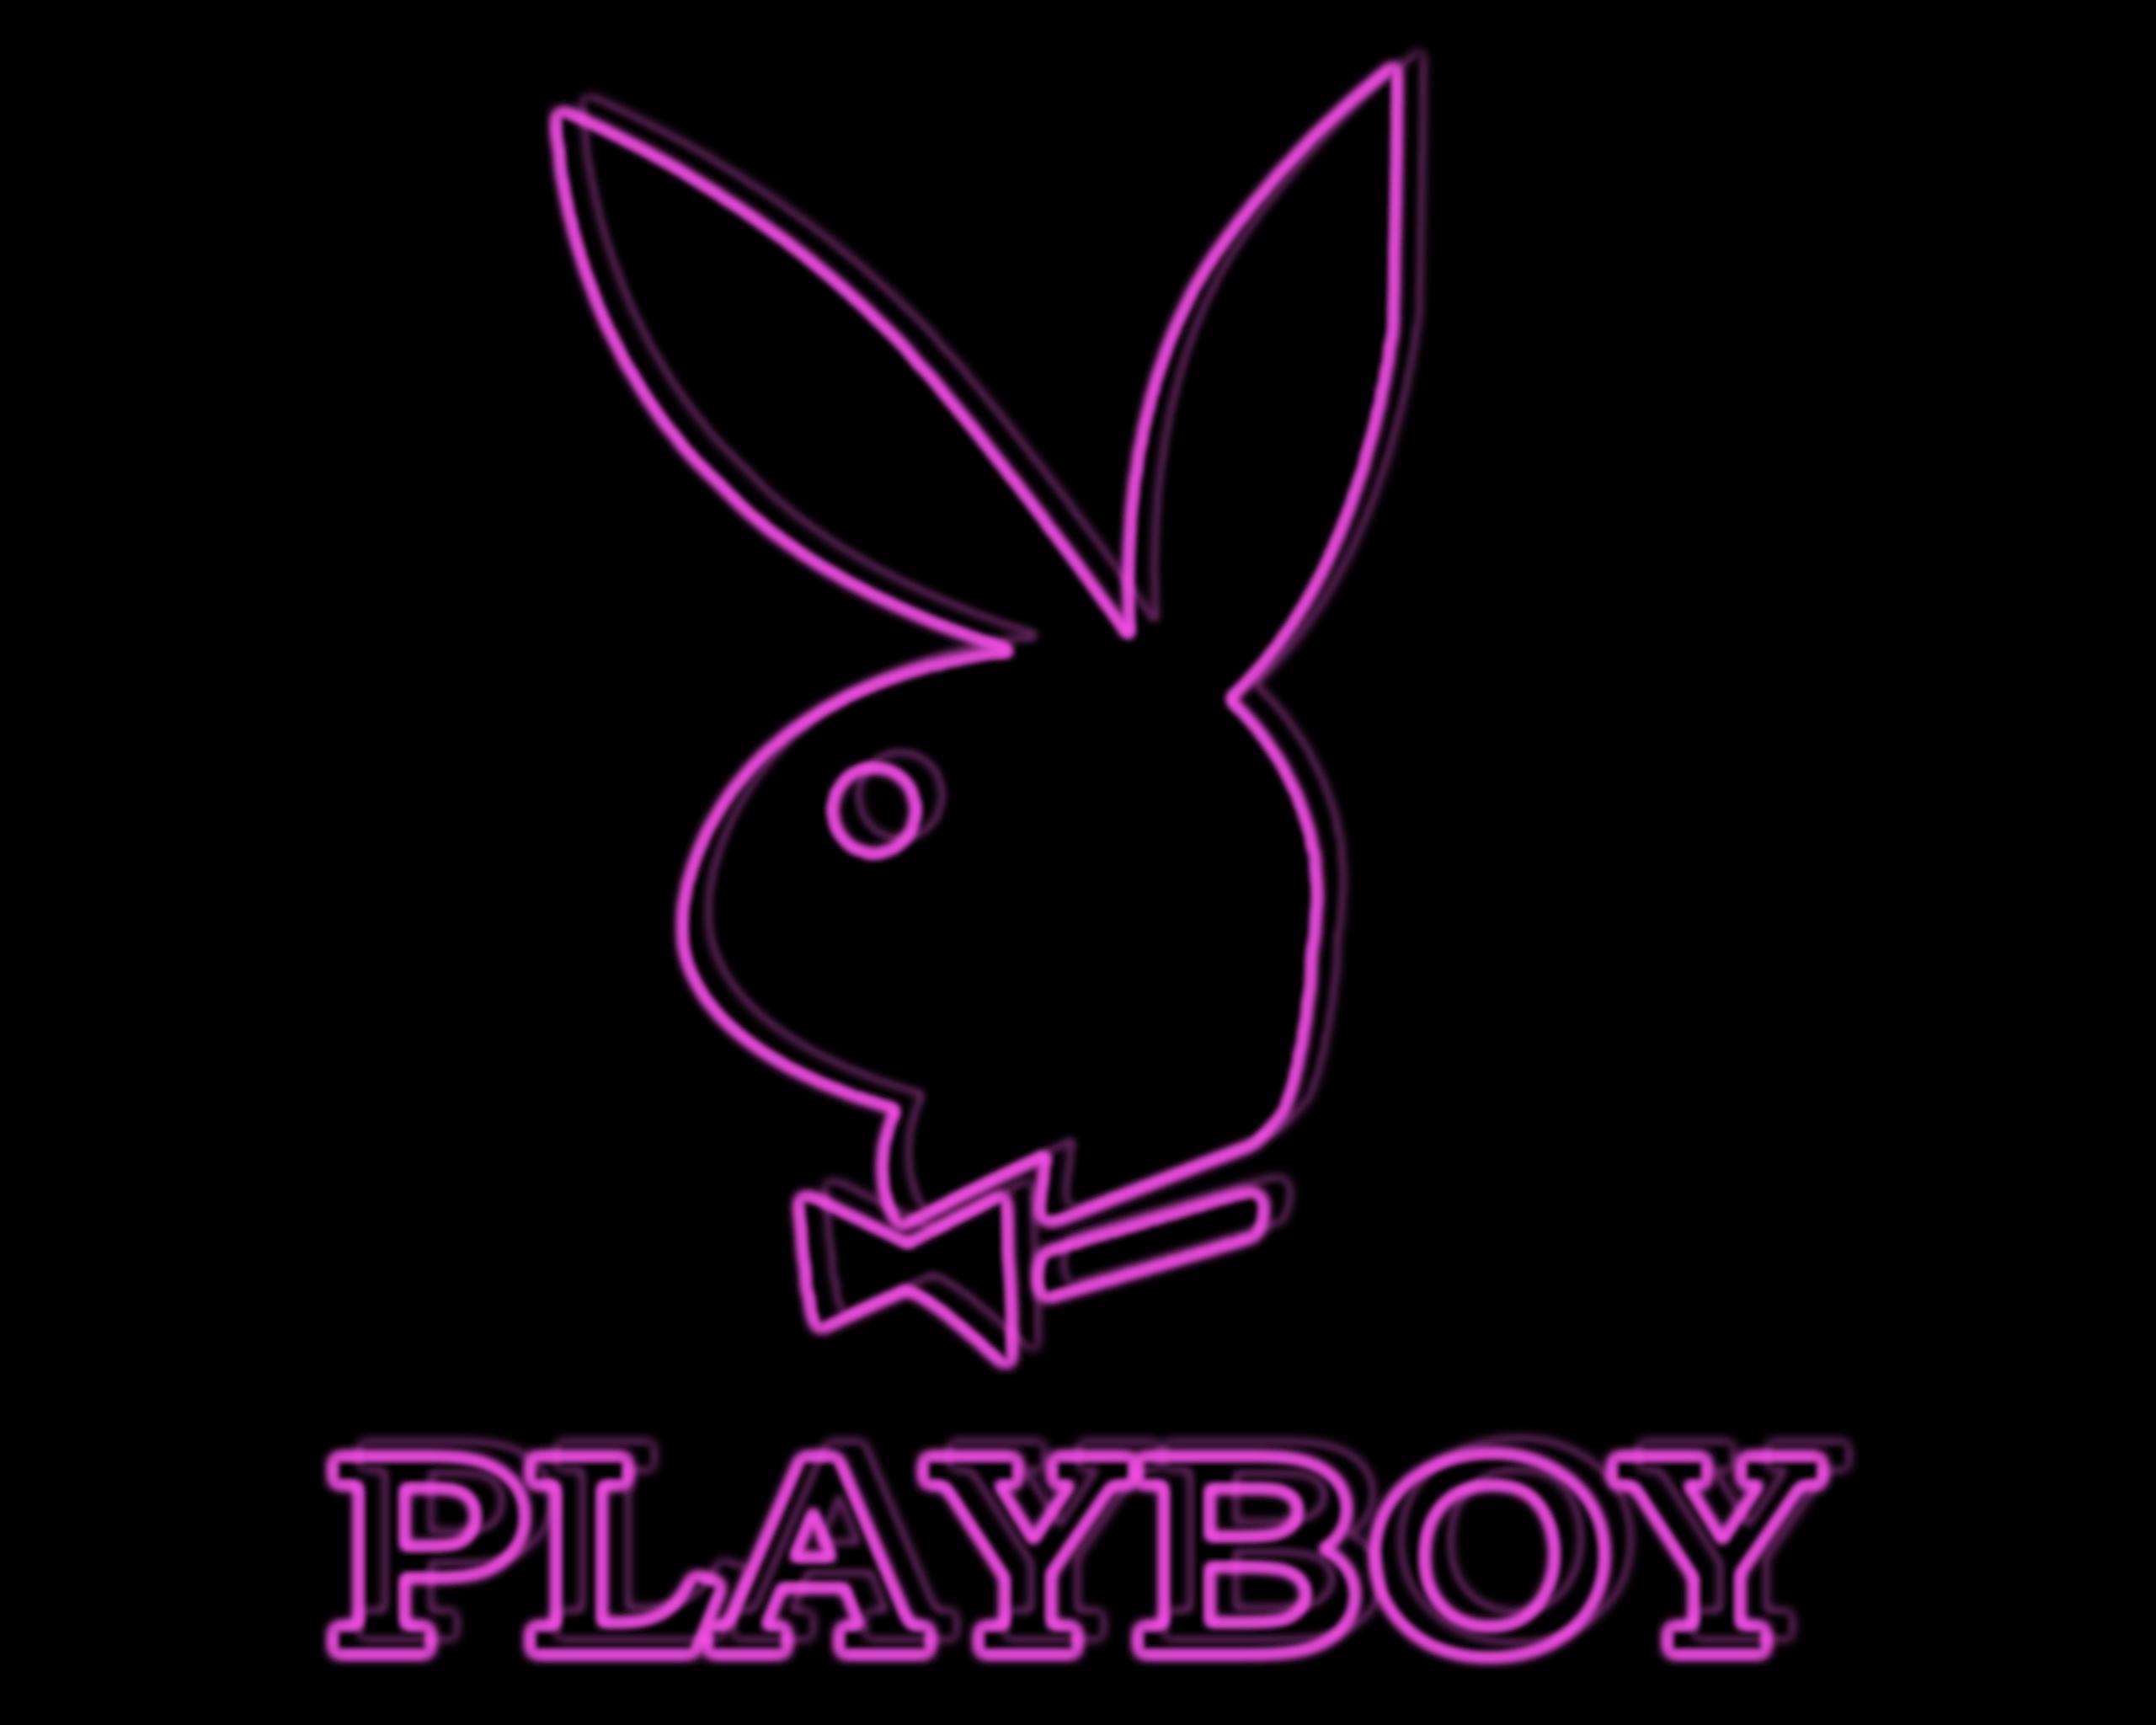 Play Boy Backgrounds - WallpaperSafari